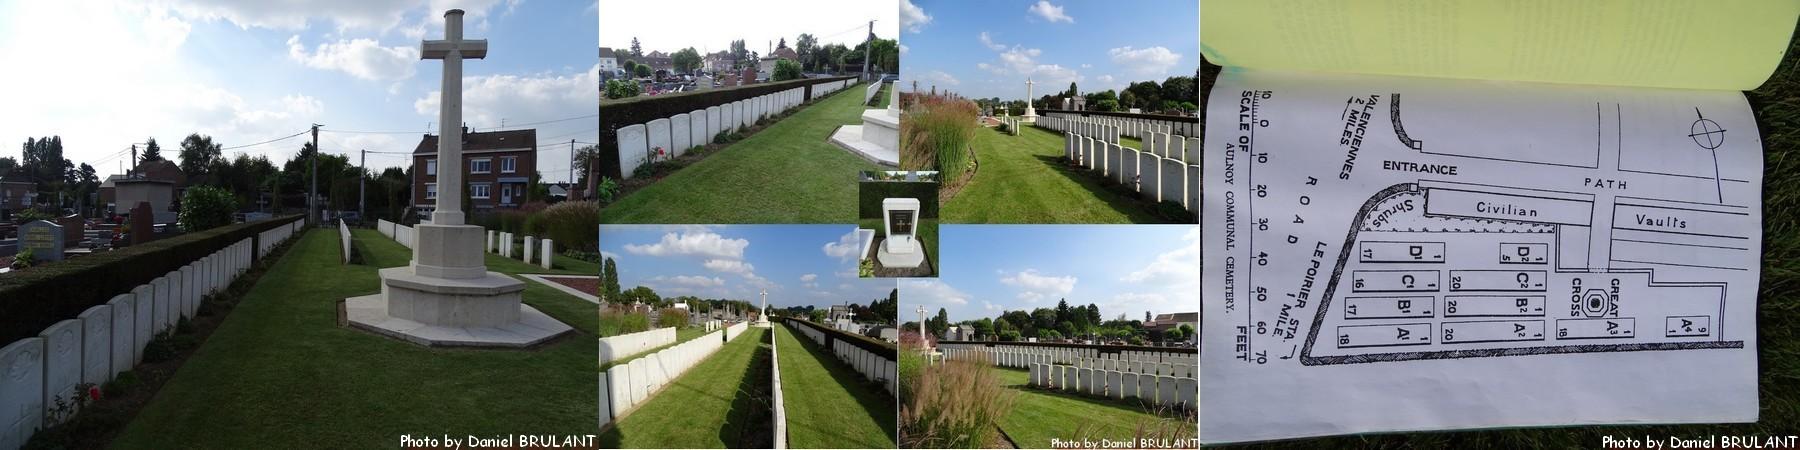 Aulnoy Communal Cemetery